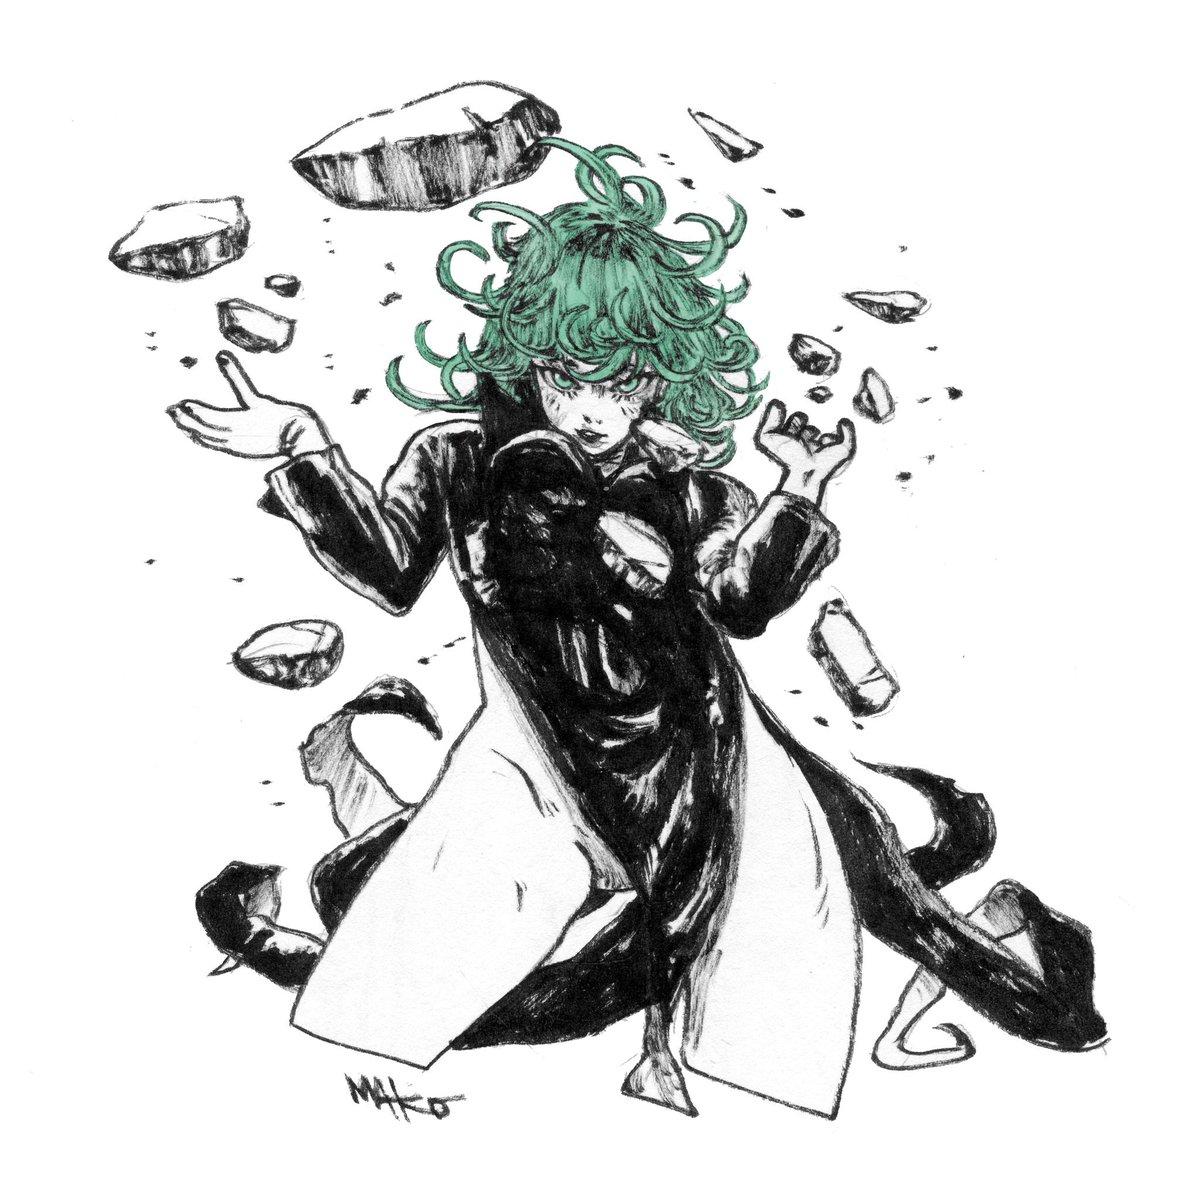 "Н•žð•'𝕜𝕠 Н•§ð•šð•""𝕖 On Twitter Mako X One Punch Man Tatsumaki Quick Tatsumaki Sketch Onepunchman Tatsumaki Fanart Saitama Sketch Anime Drawing Manga Tornadoofterror Https T Co Ap1xosx8gv"